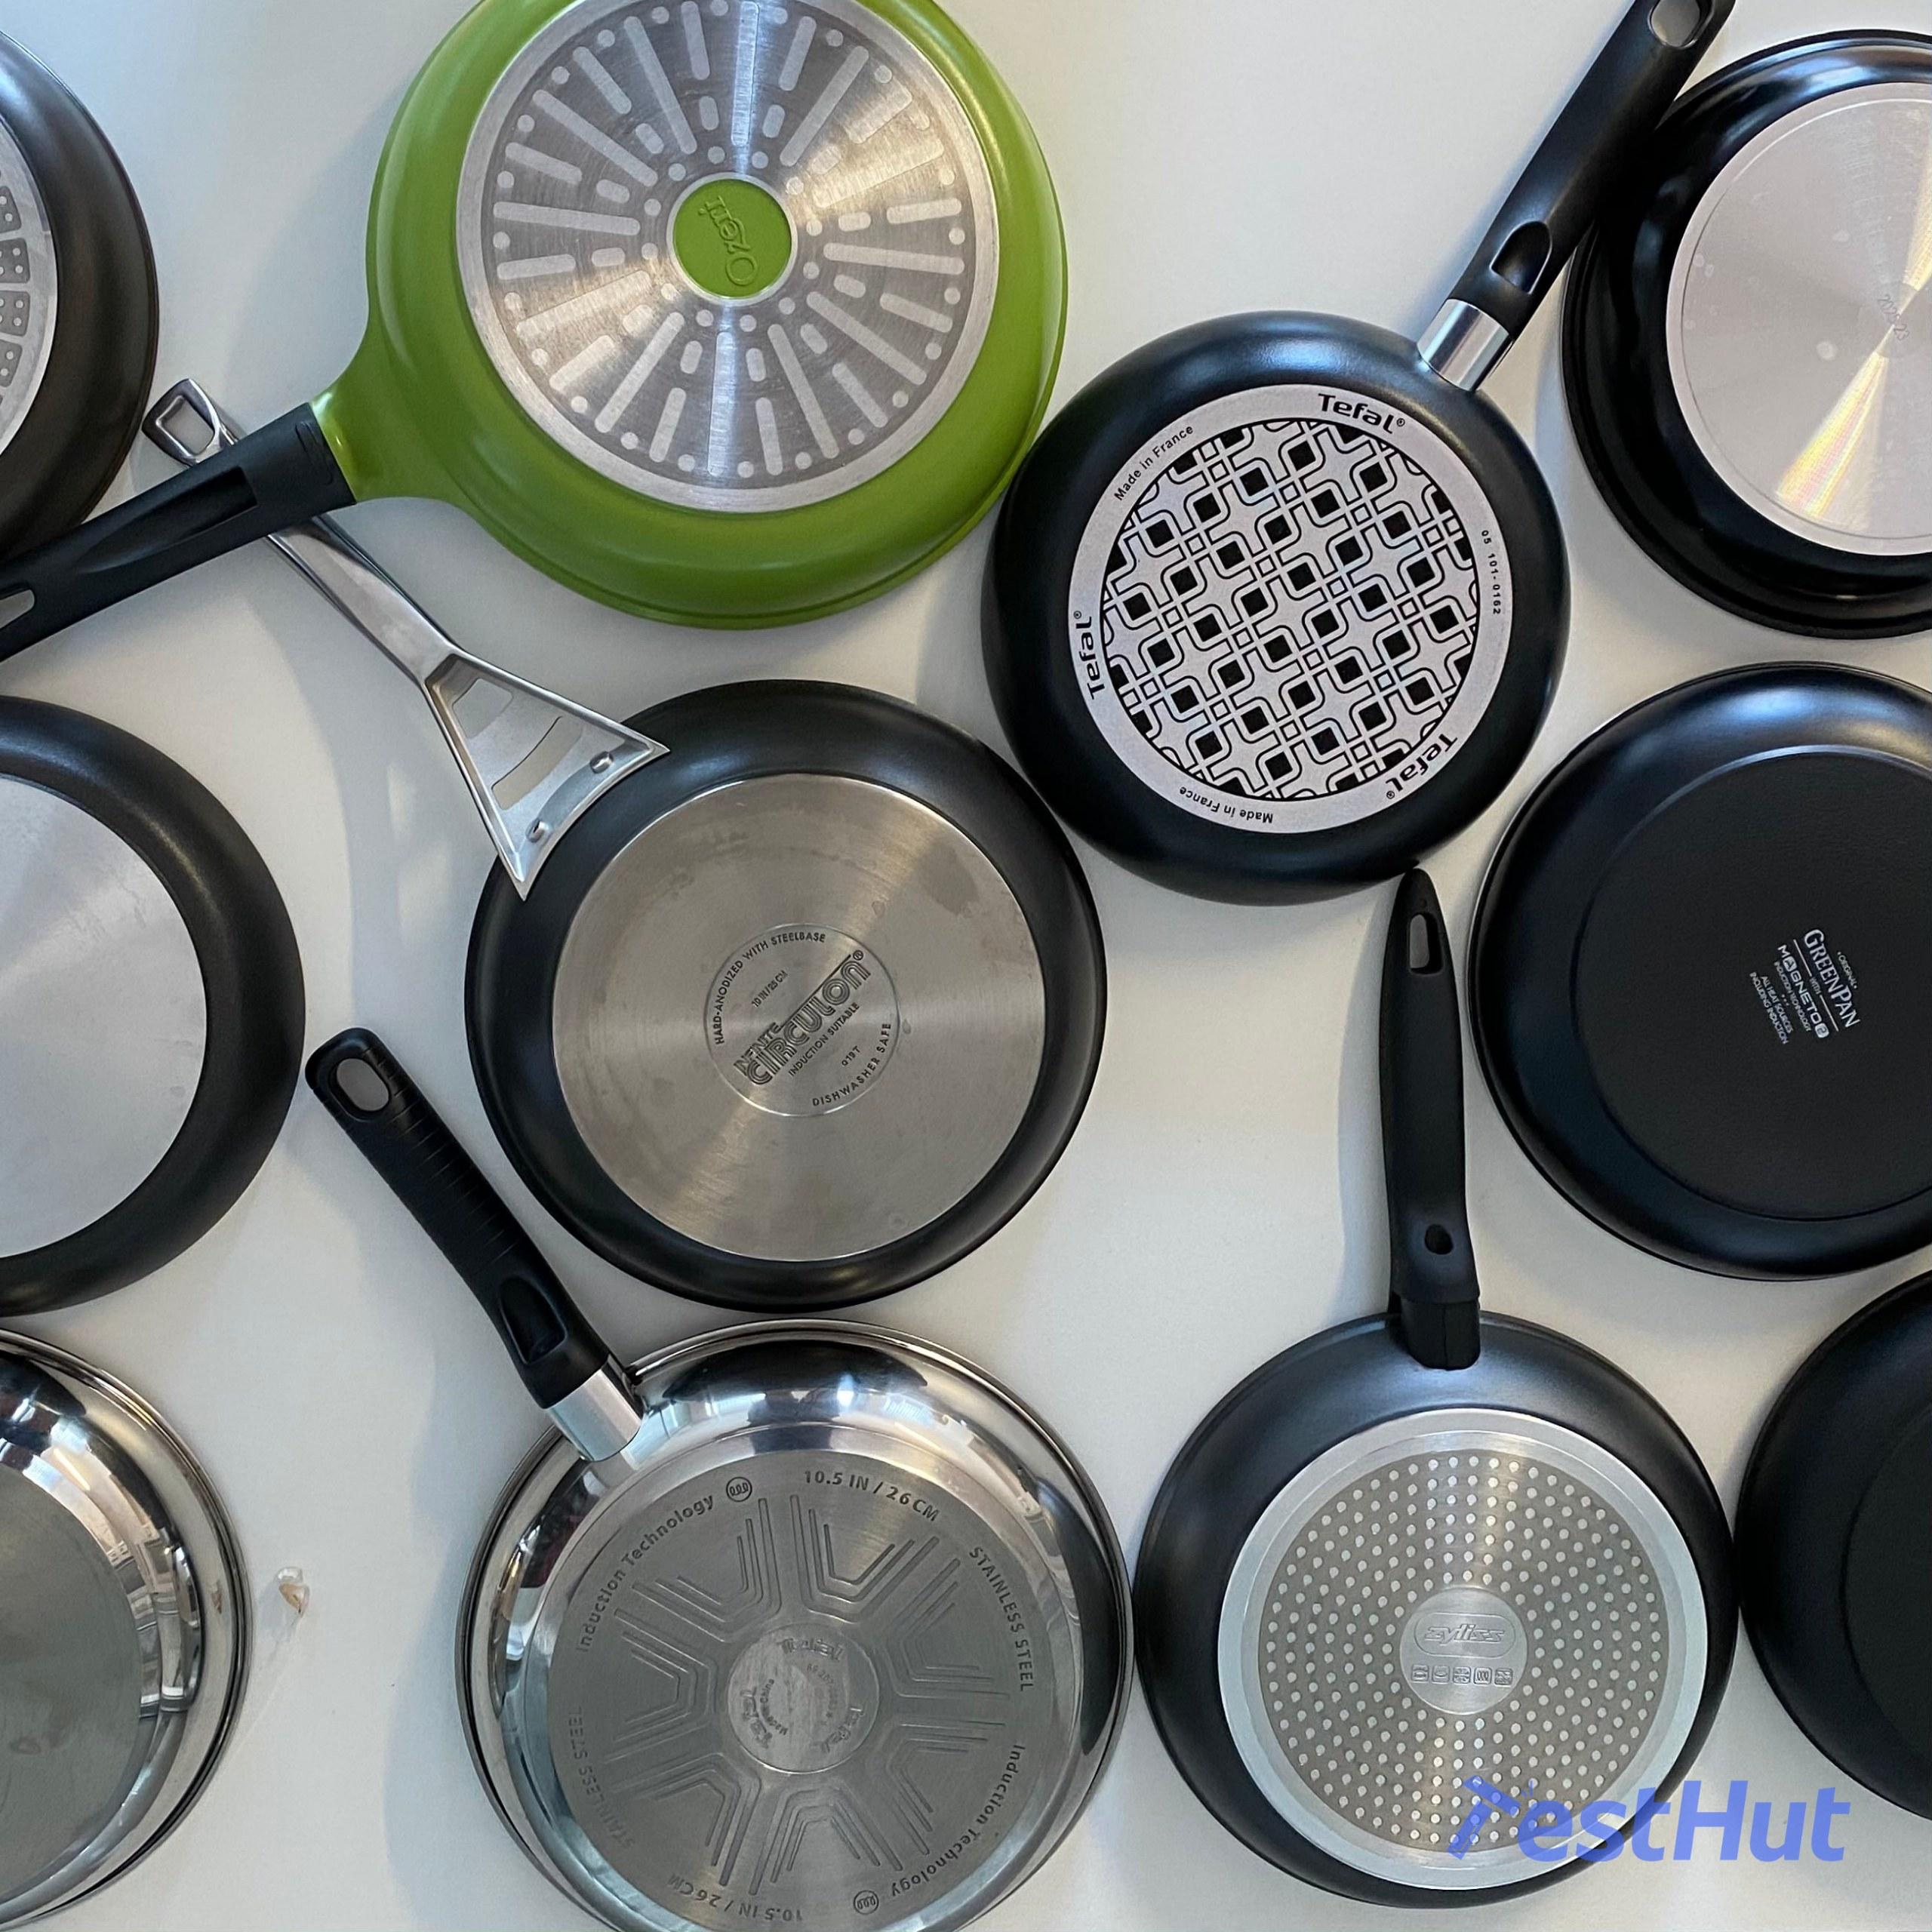 Frying pans backs